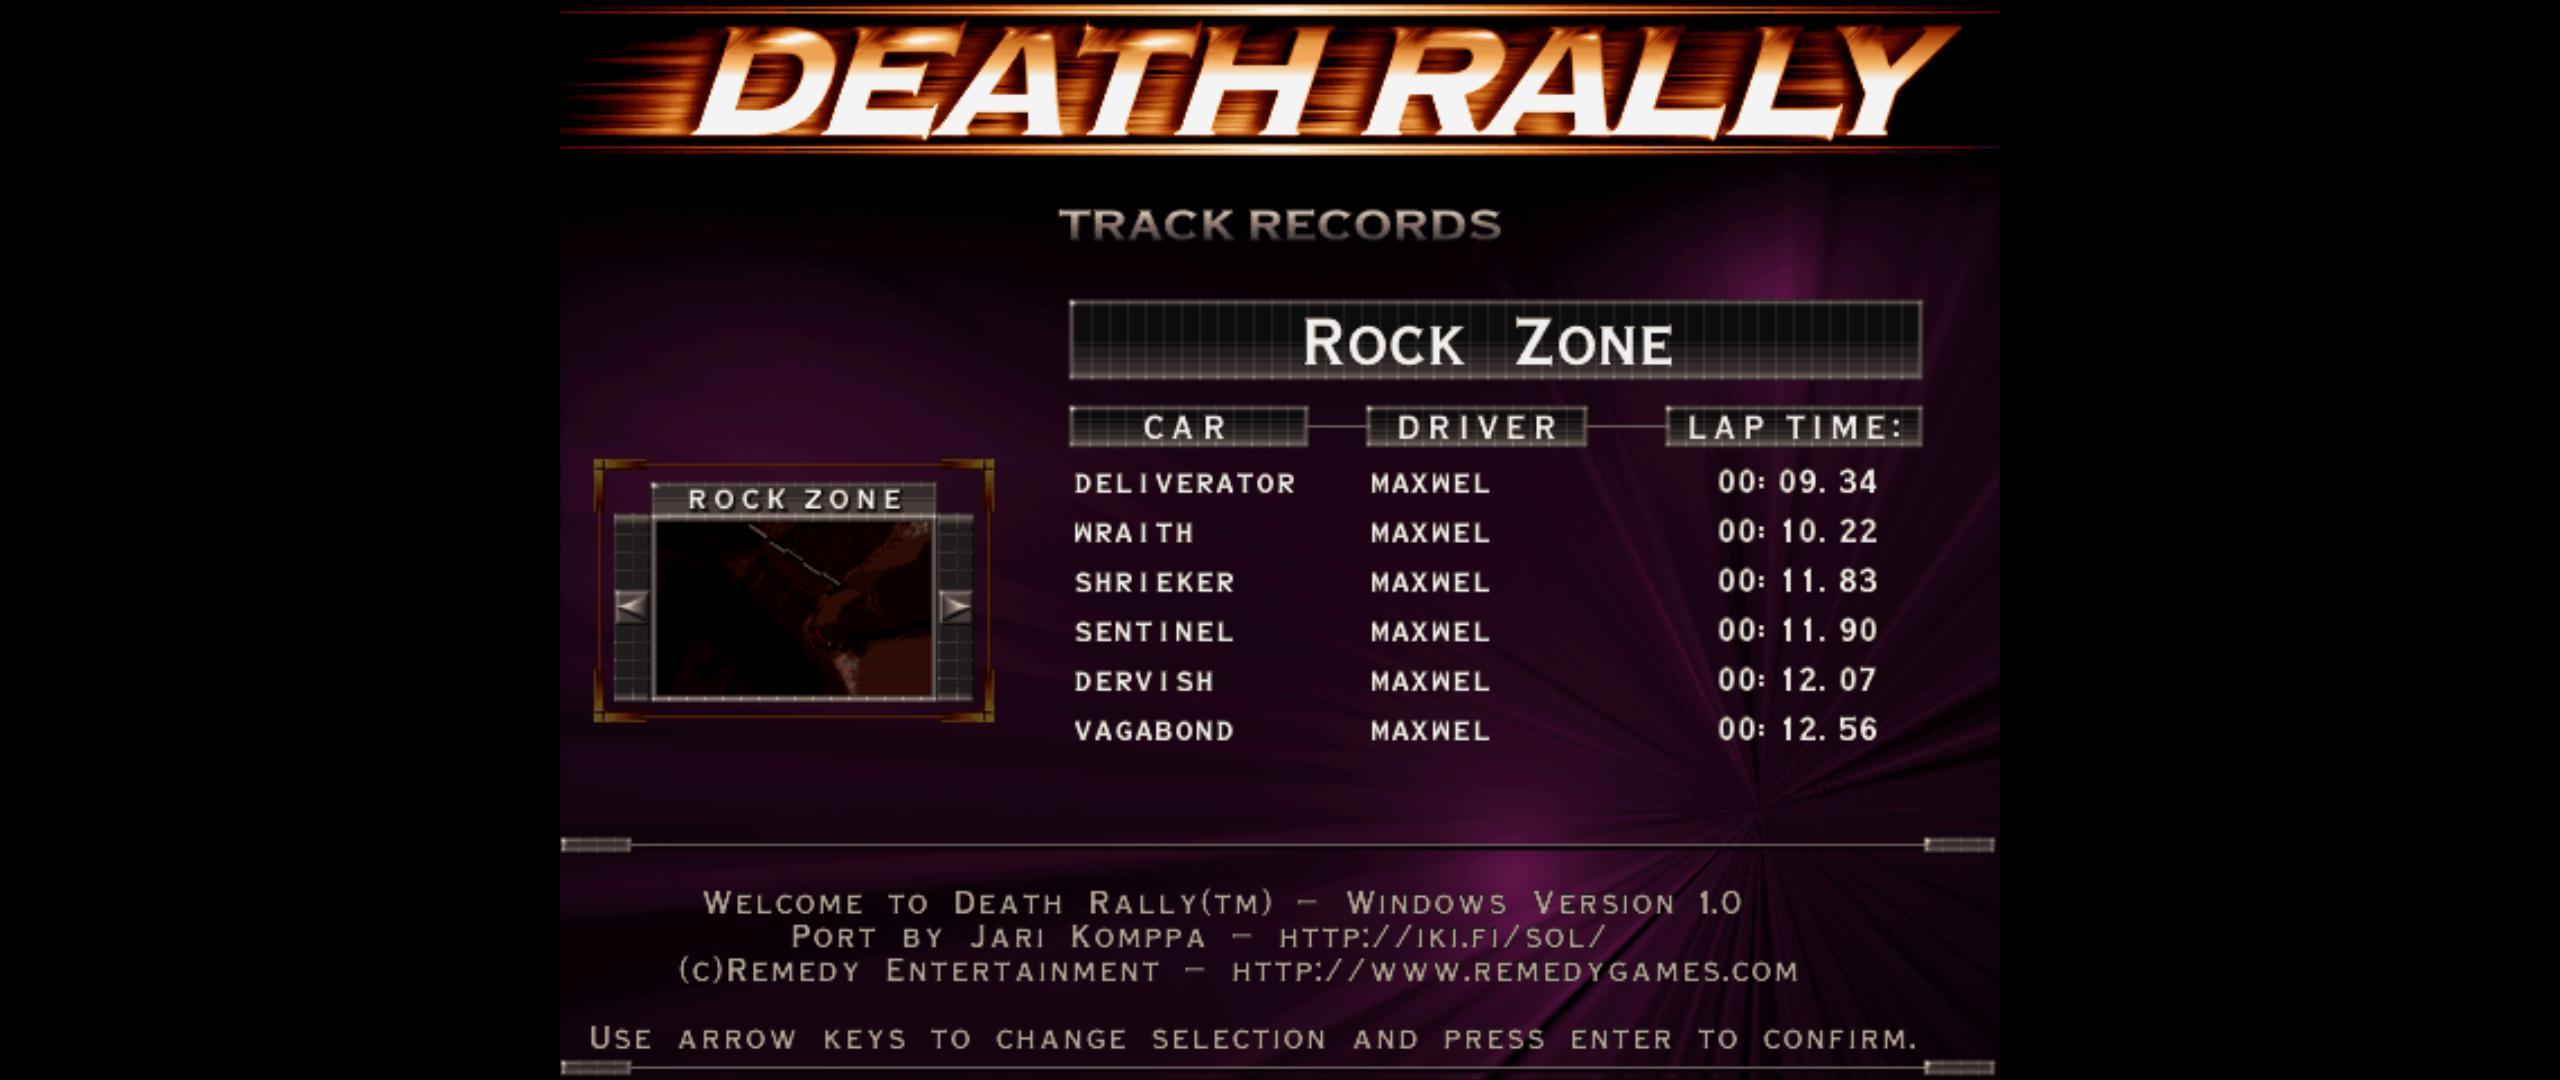 Maxwel: Death Rally [Rock Zone, Shrieker Car] (PC) 0:00:11.83 points on 2016-03-03 02:53:29